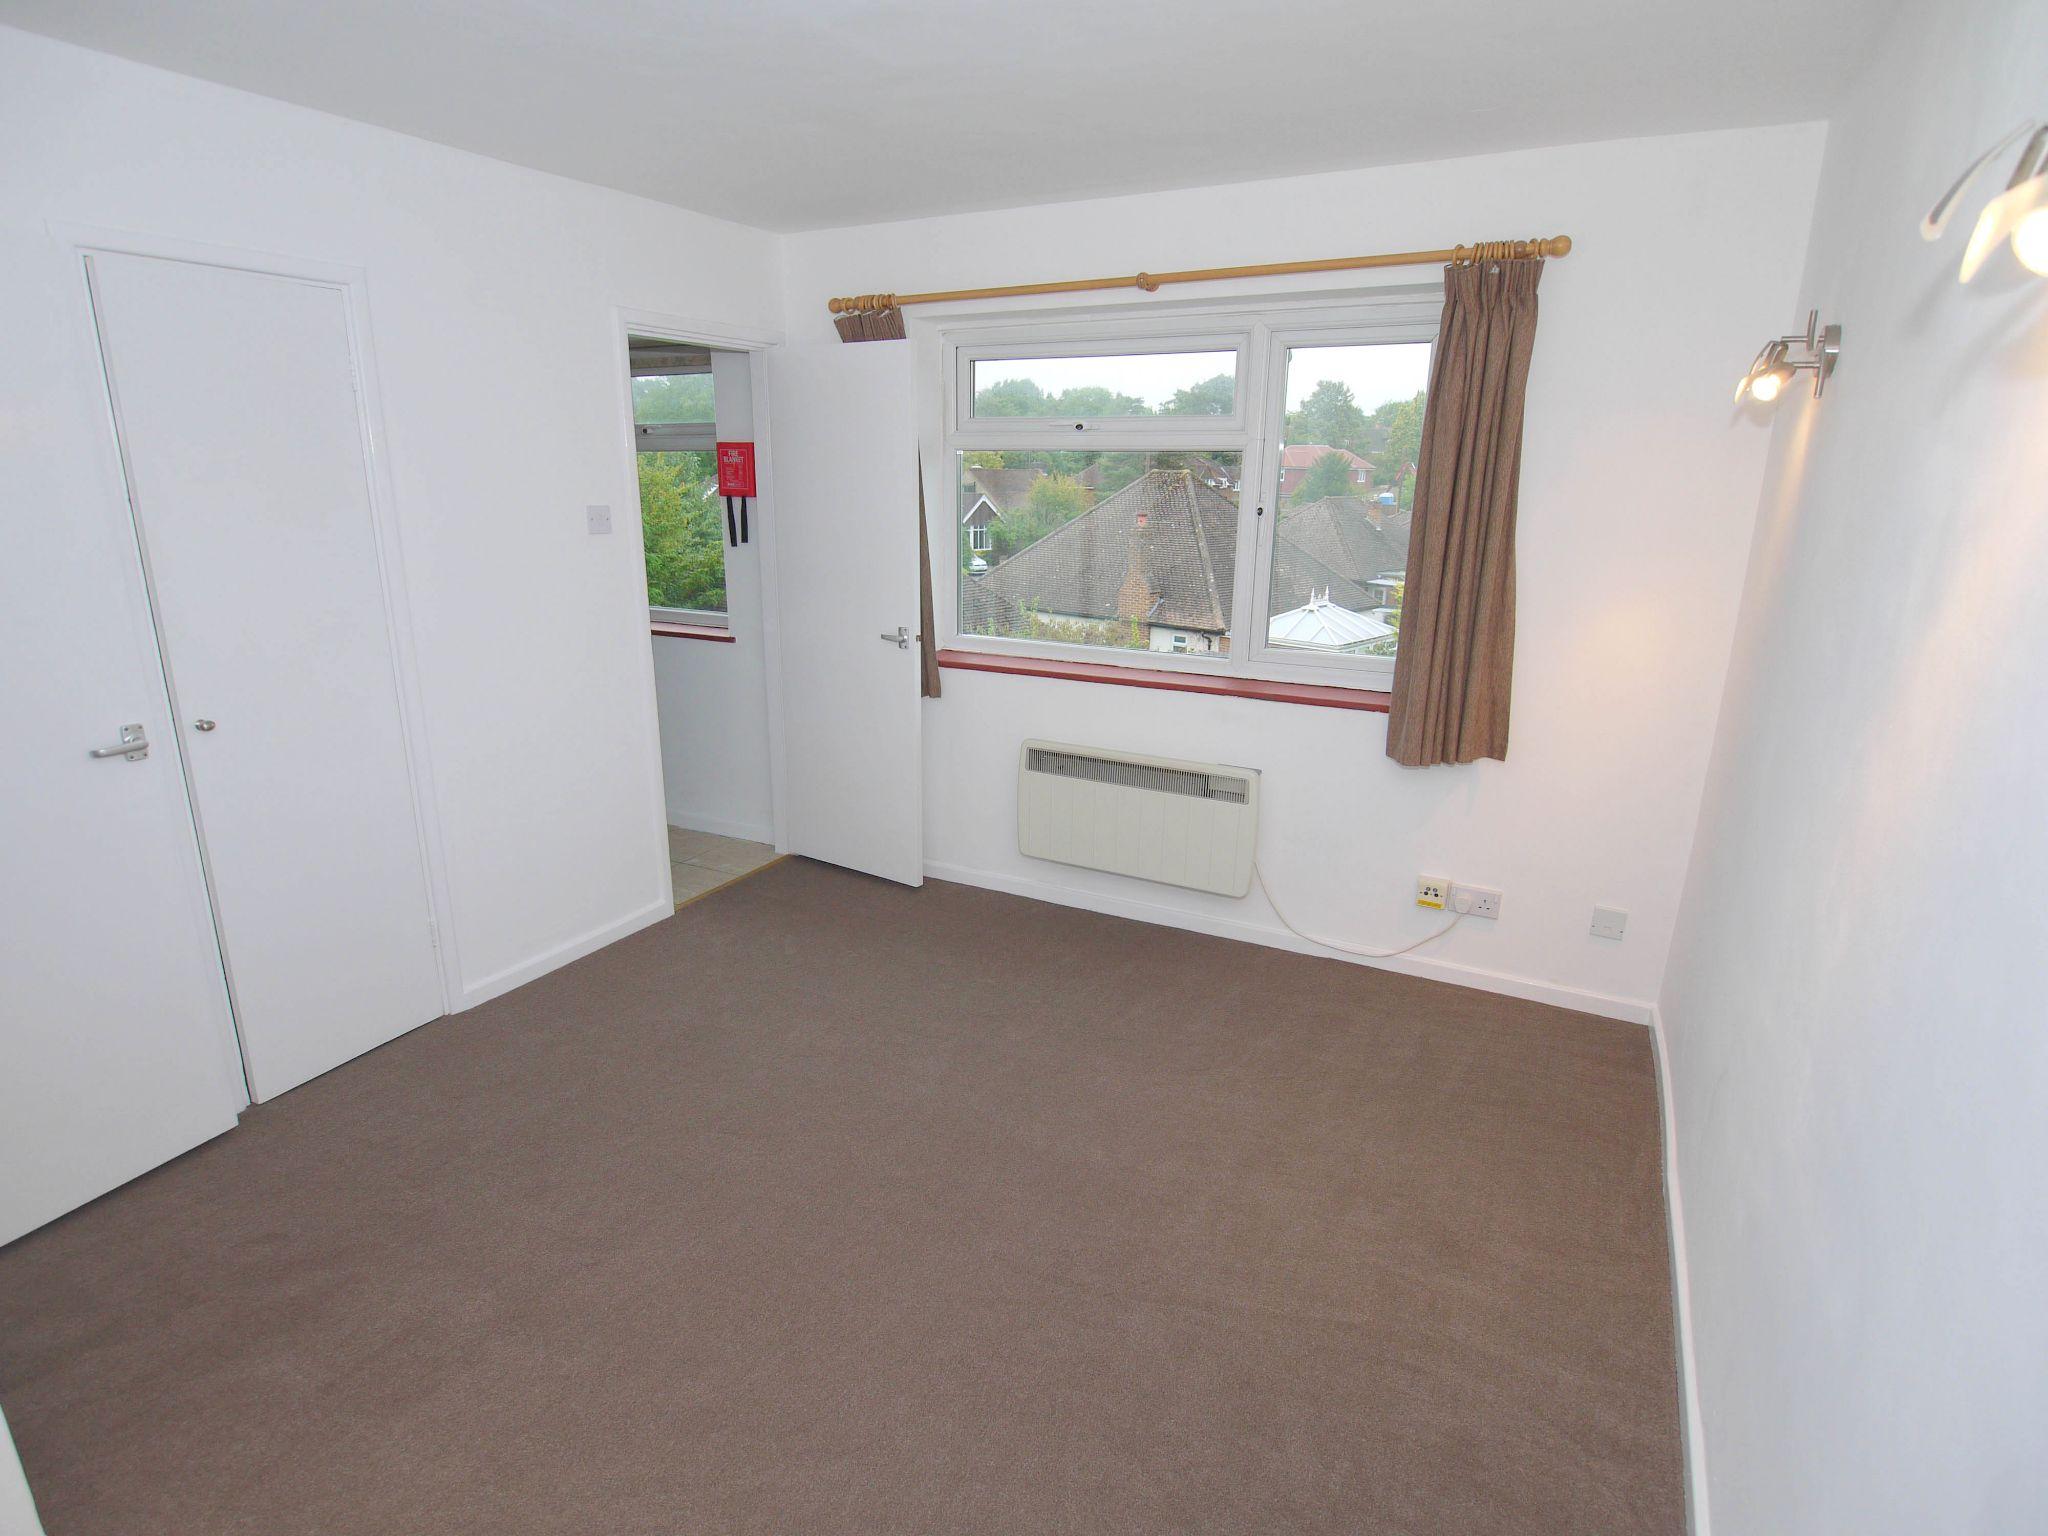 1 bedroom apartment flat/apartment For Sale in Sevenoaks - Photograph 4